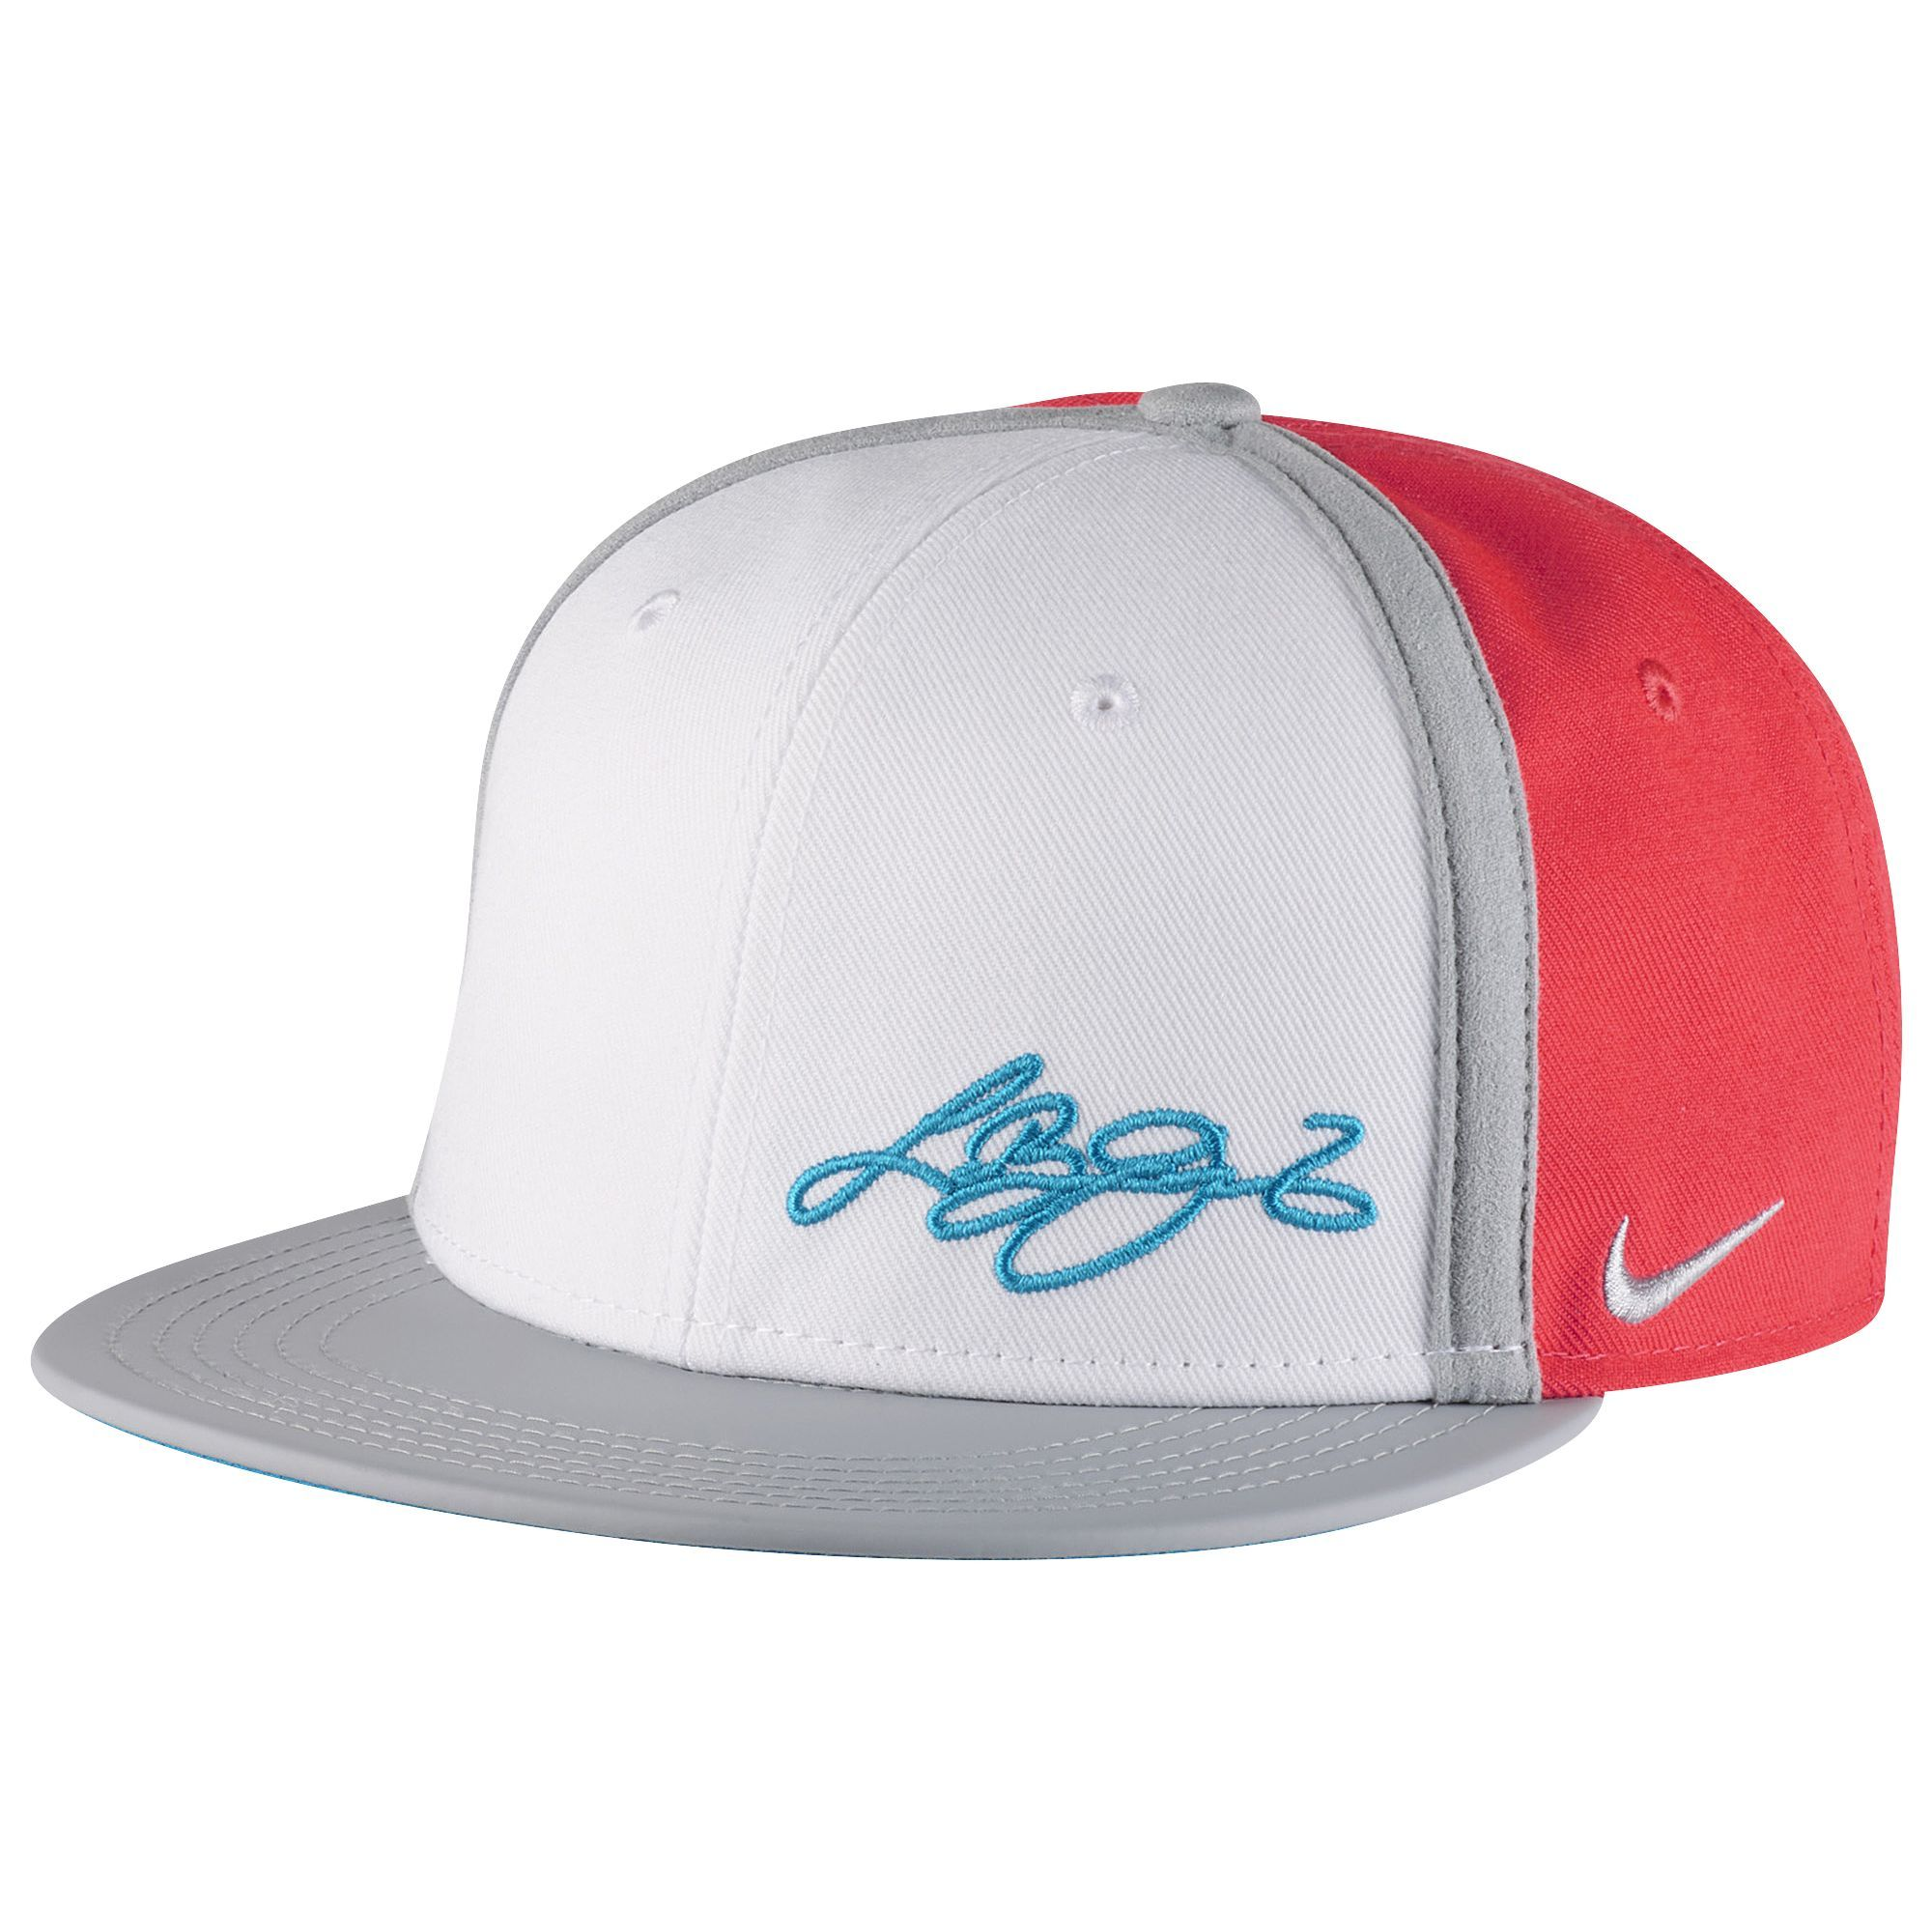 0b9016f0a Footlocker on Wondermall - Nike LeBron True Snapback Cap - Boys ...